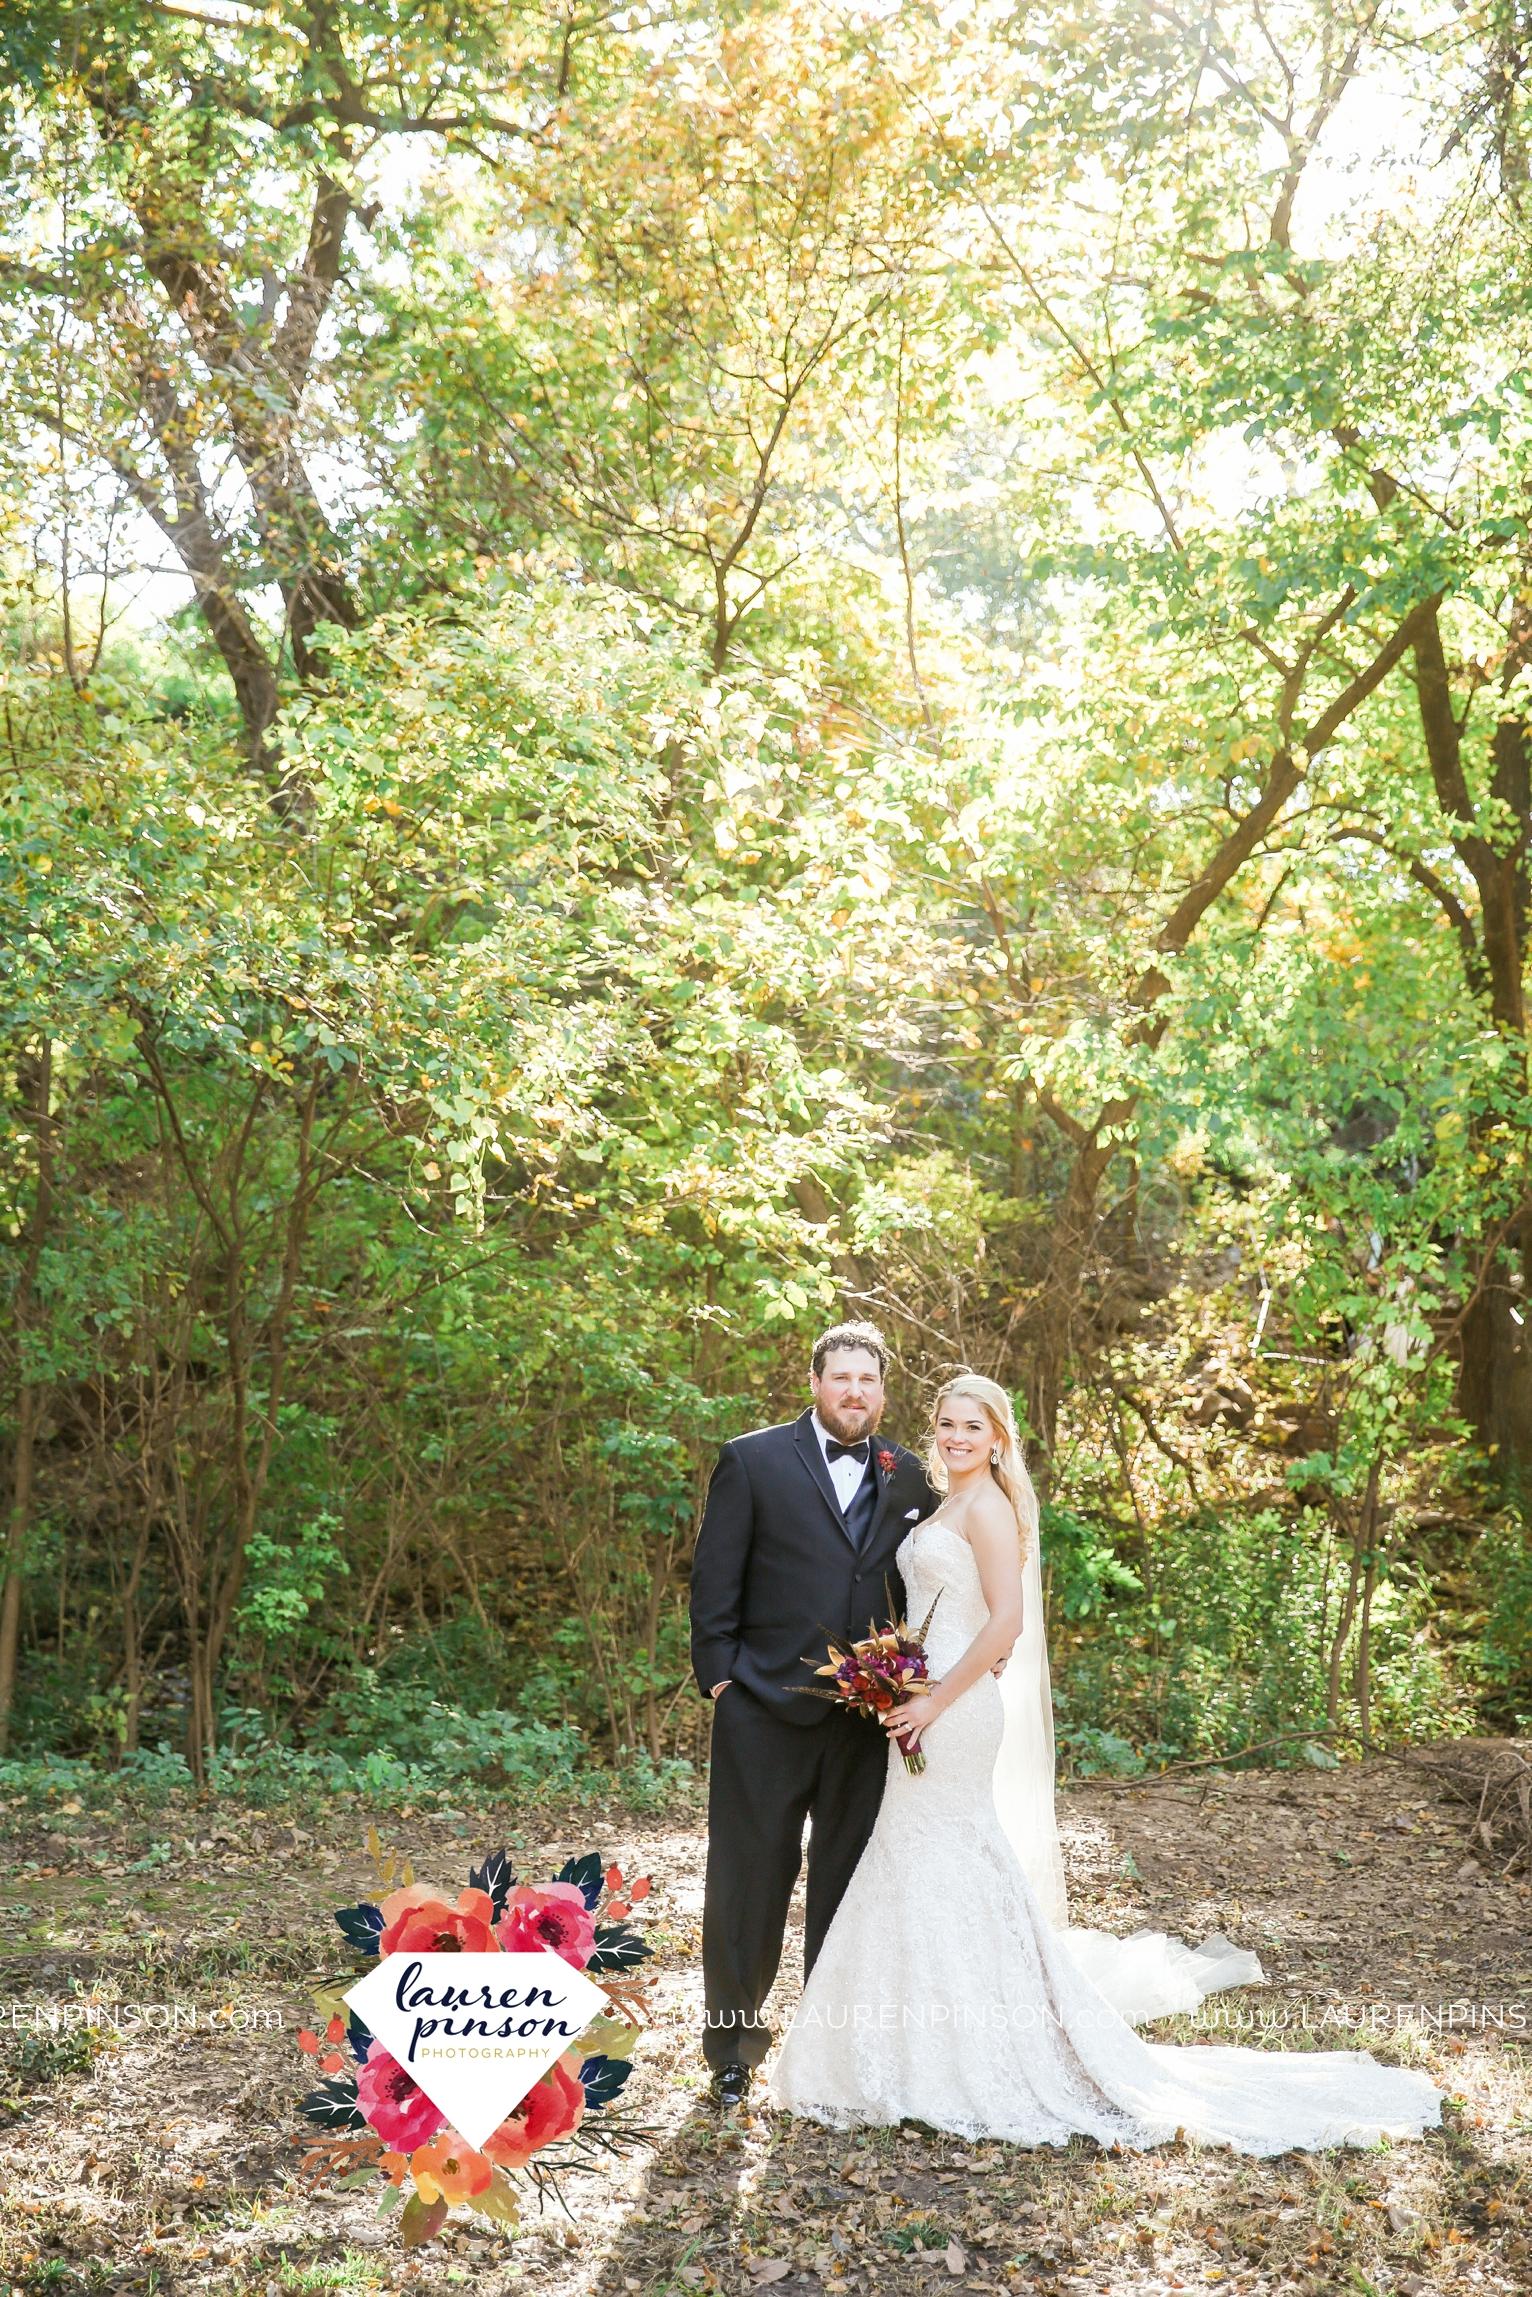 rustic-wichita-falls-texas-wedding-photographer-gold-glam-mayfield-events-market-street-united-allue-bridals-fall_1740.jpg